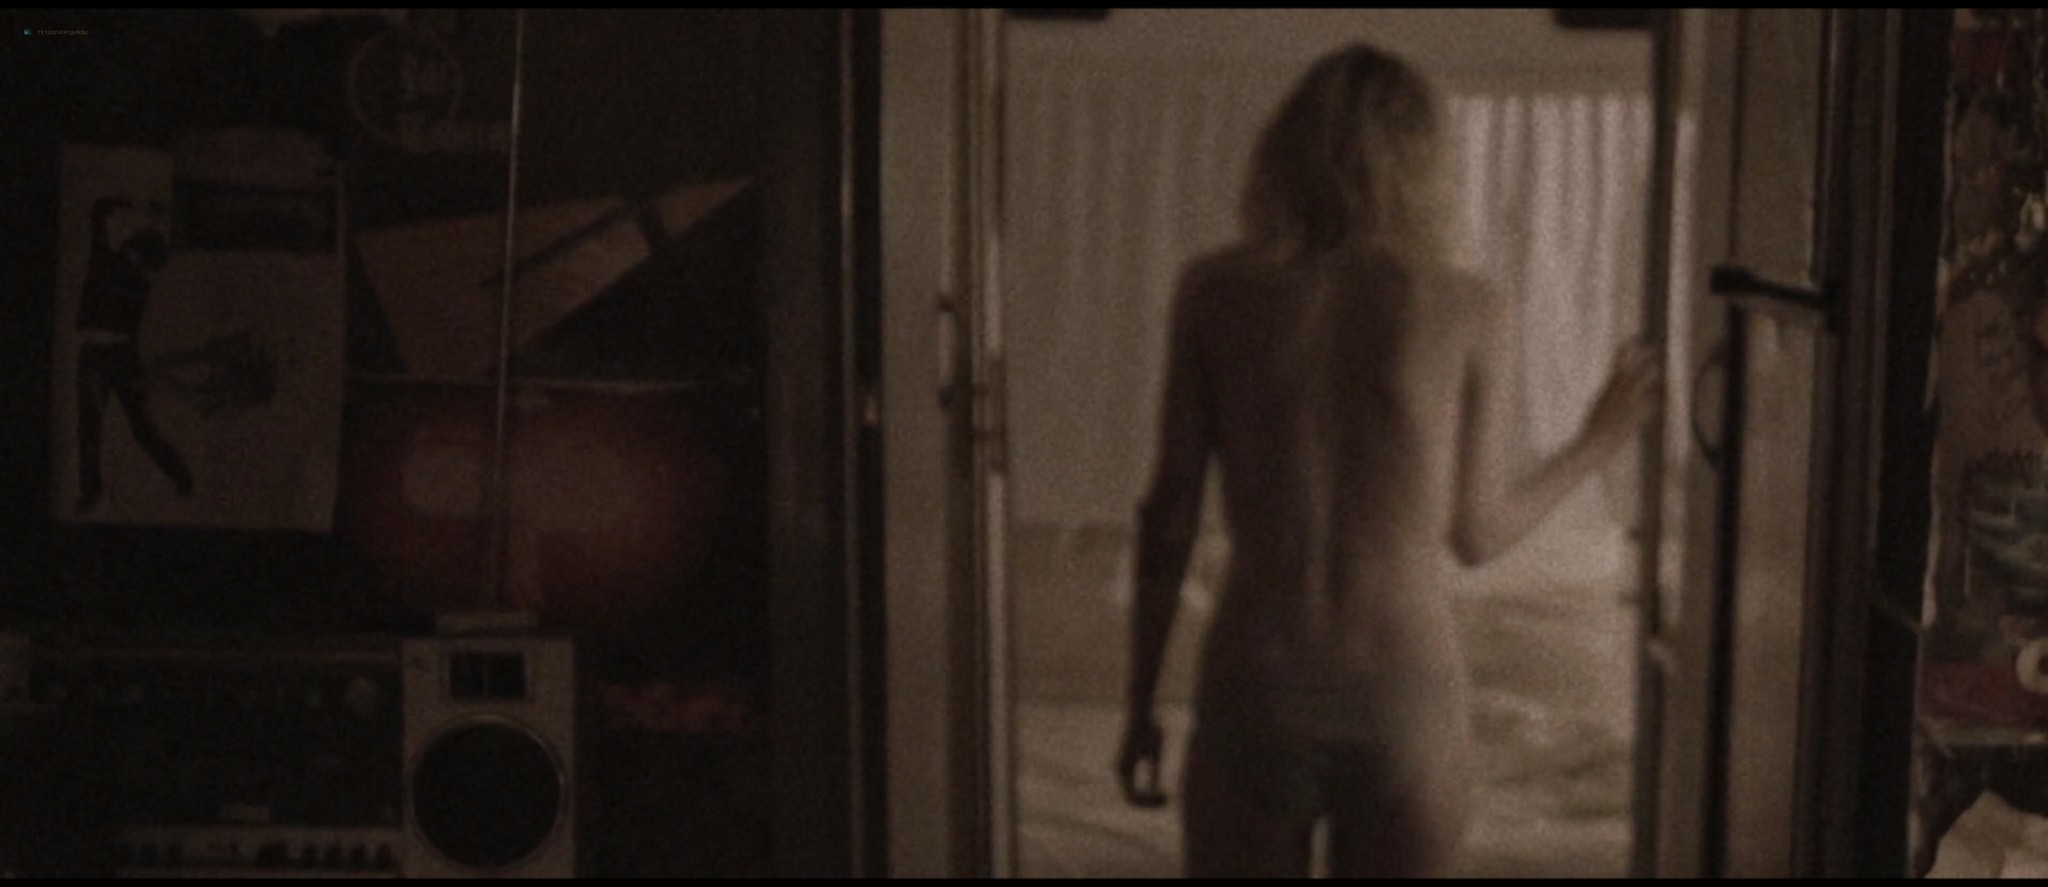 Dakota Fanning hot sex Evan Rachel Wood sexy - Viena and the Fantomes (2020) HD 1080p Web (12)